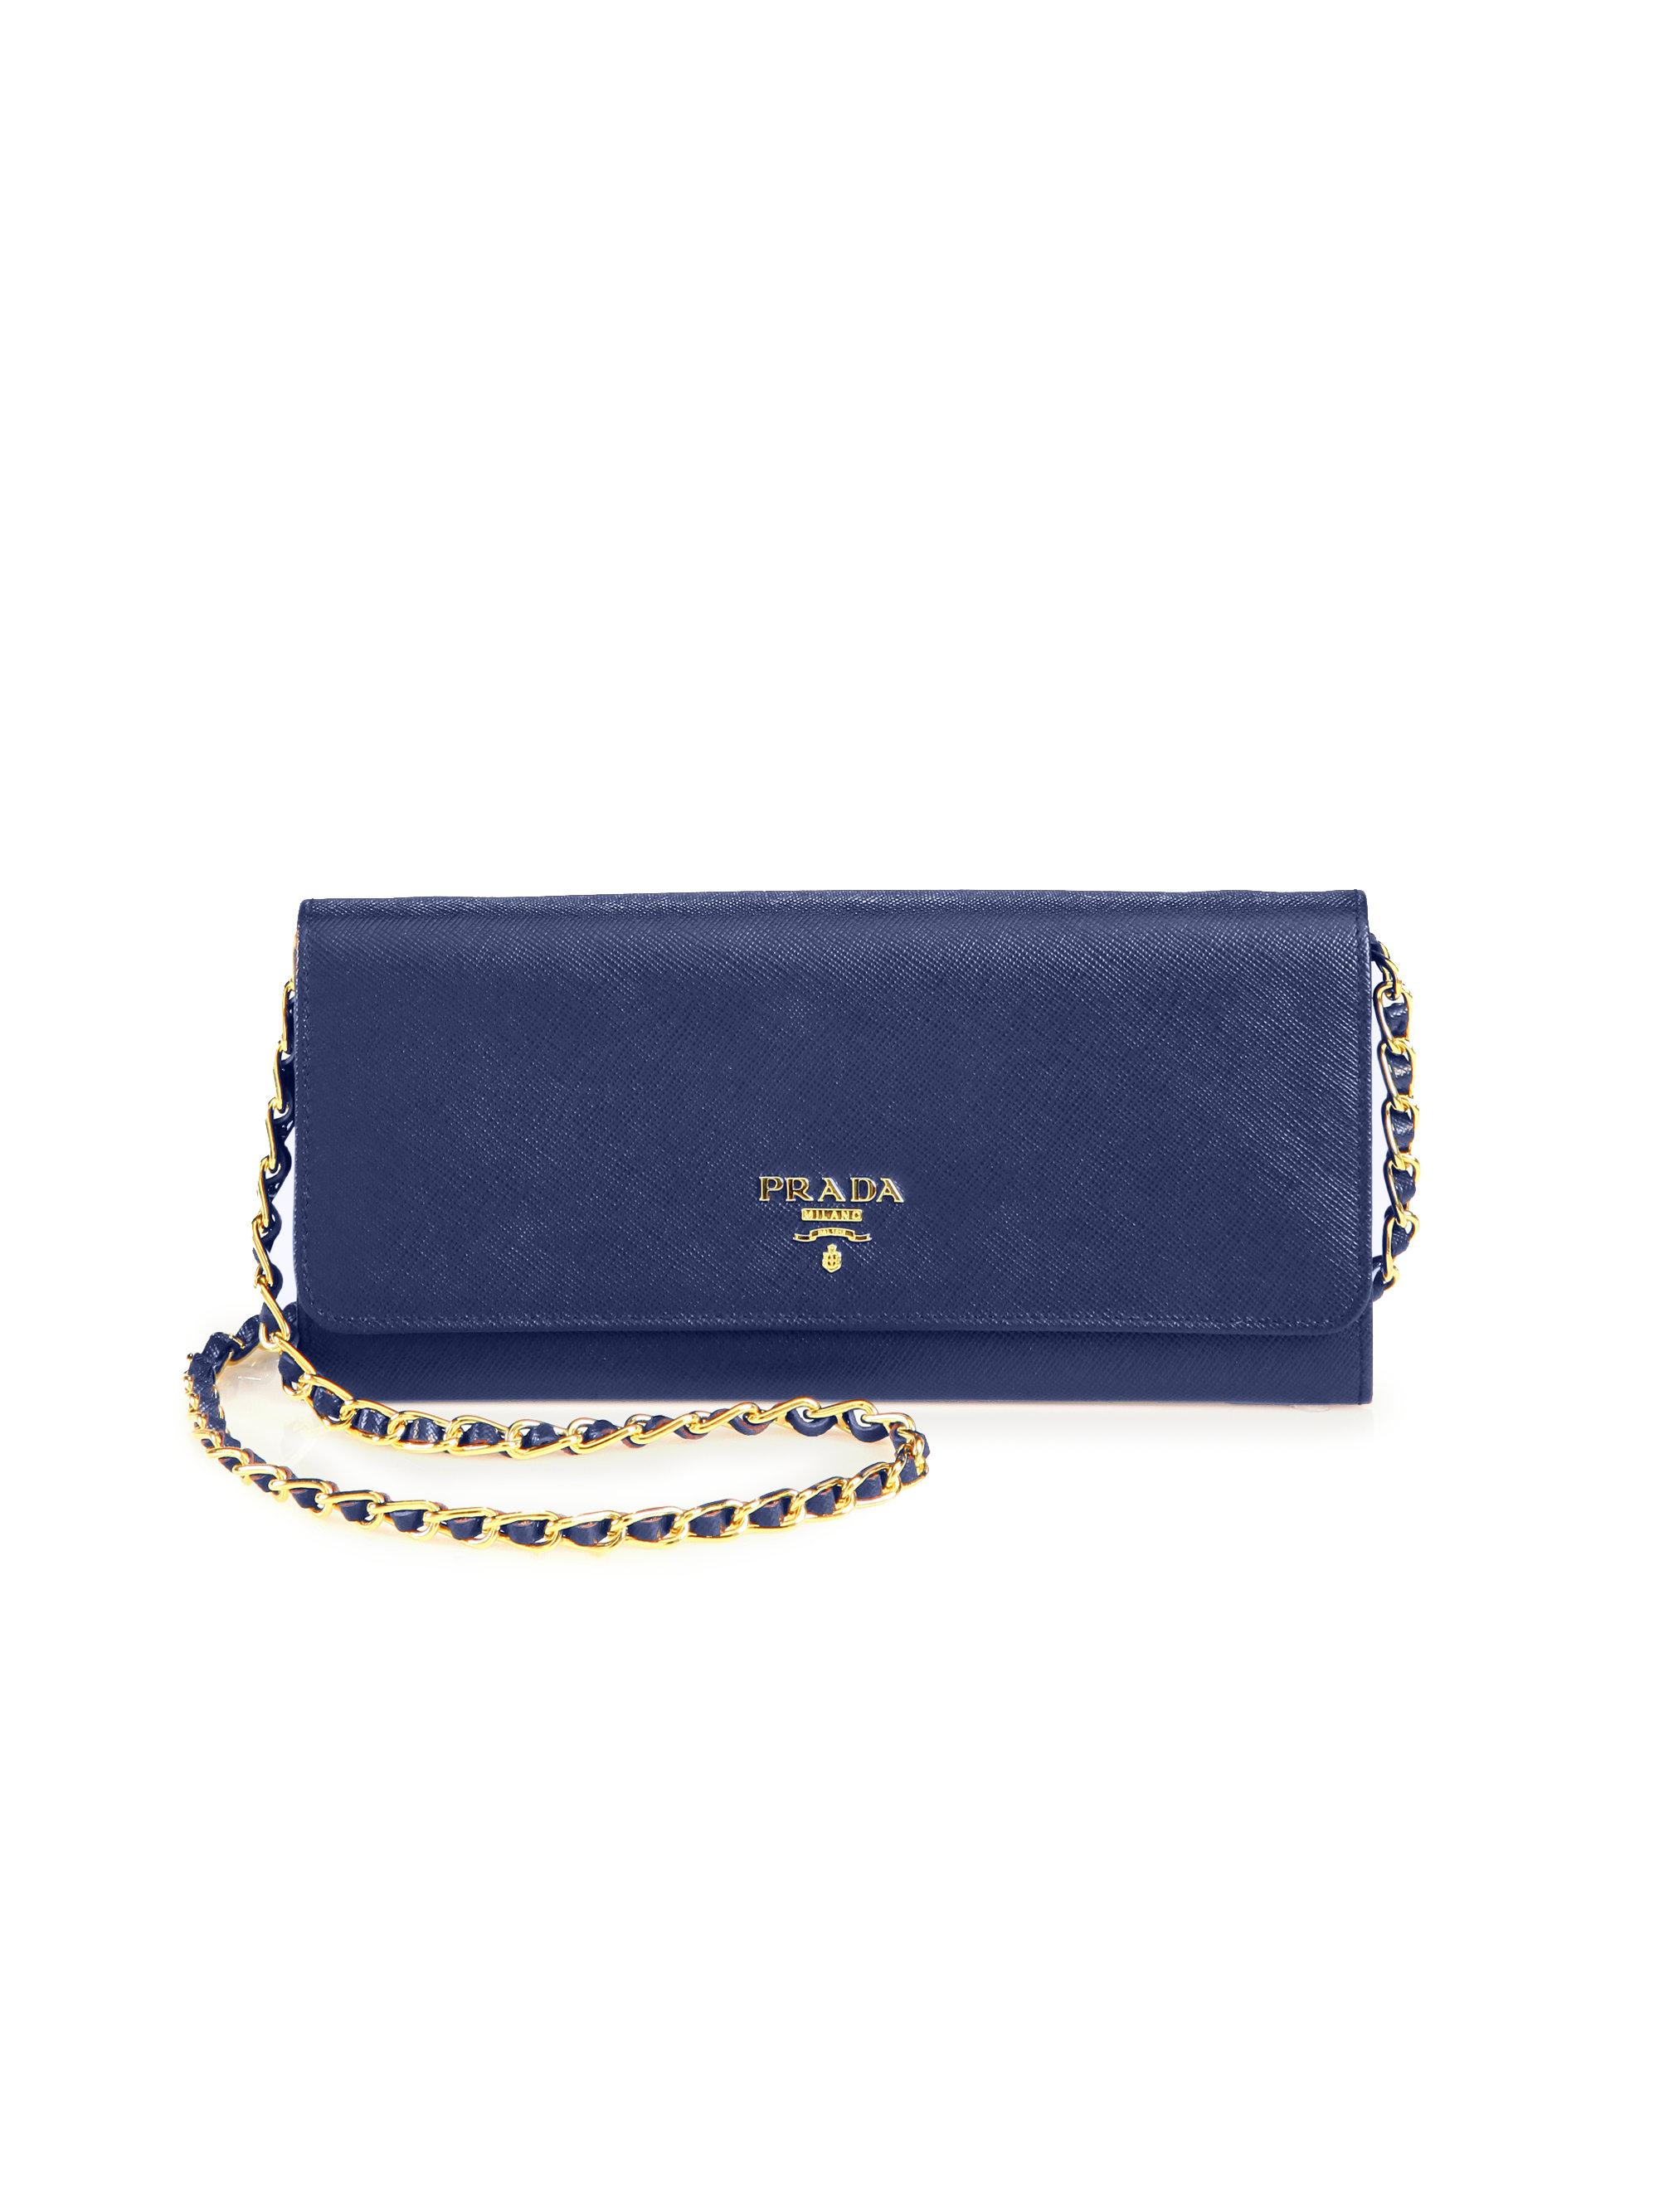 prada chain crossbody wallet